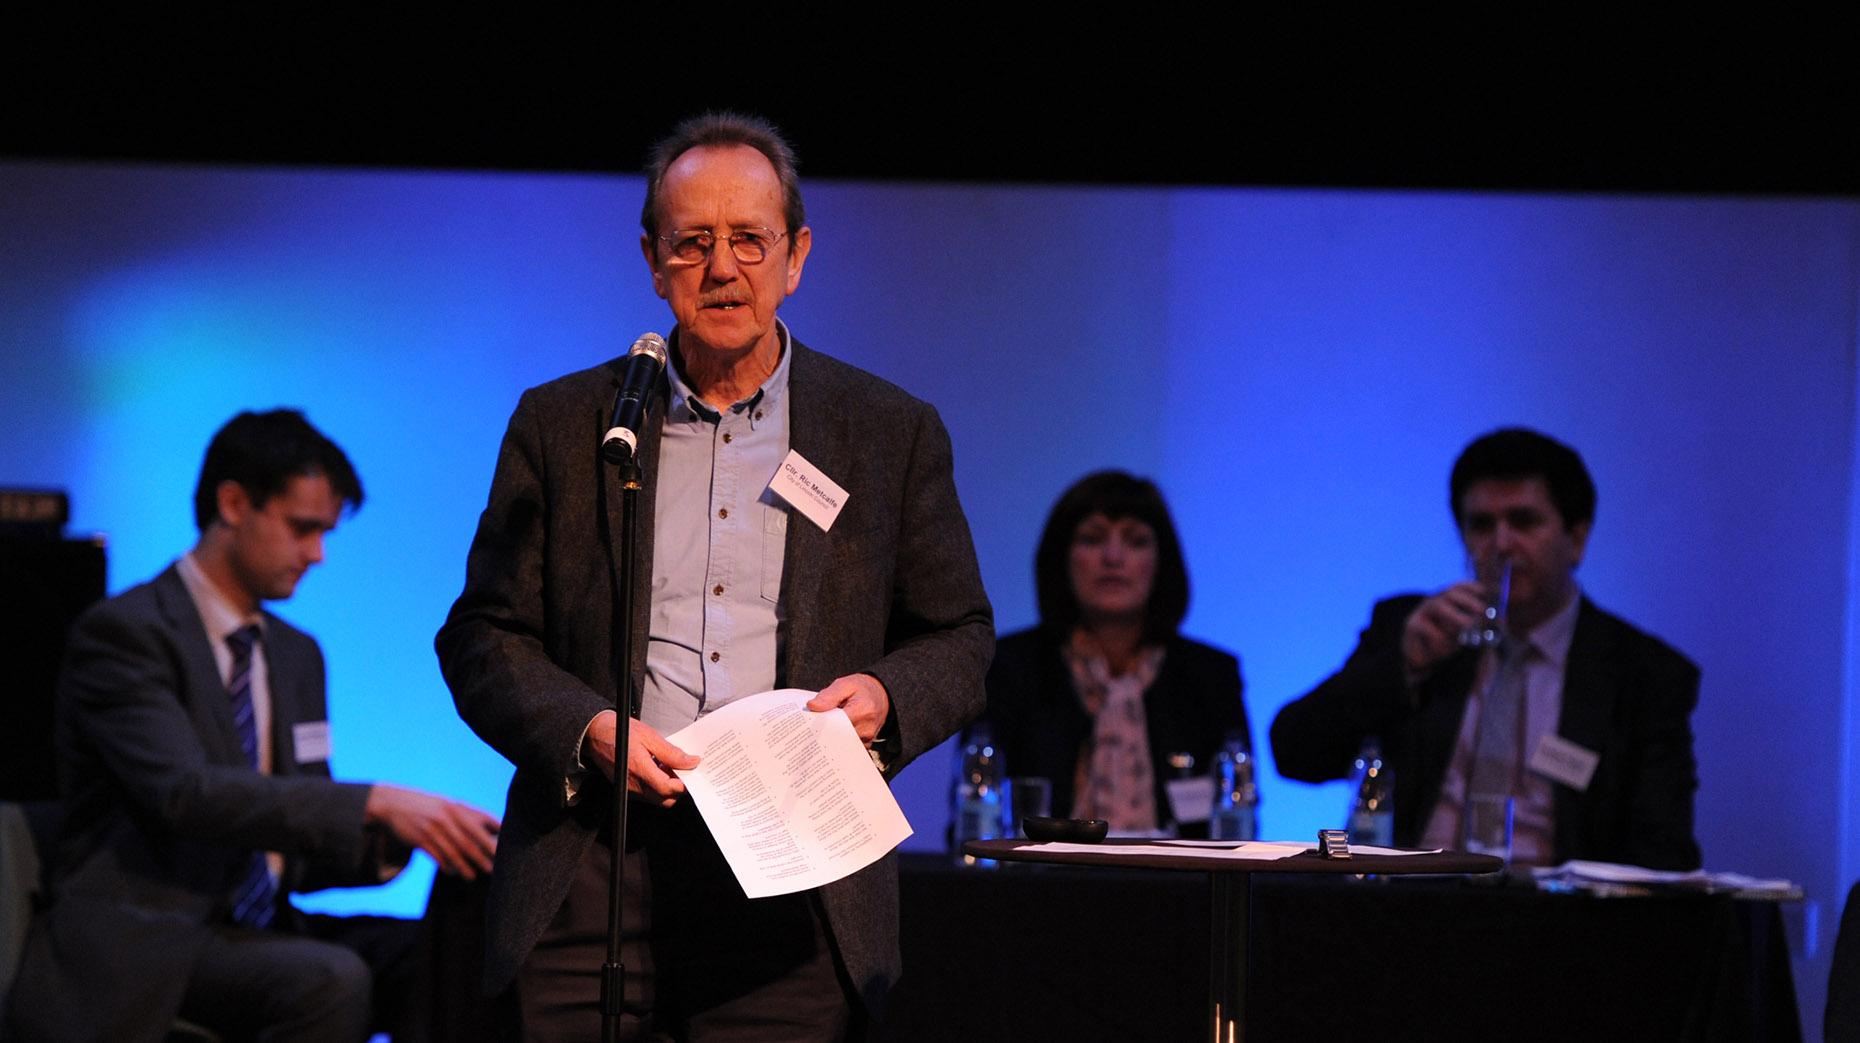 City Councillor and Council Leader Ric Metcalfe. Photo: Stuart Wilde